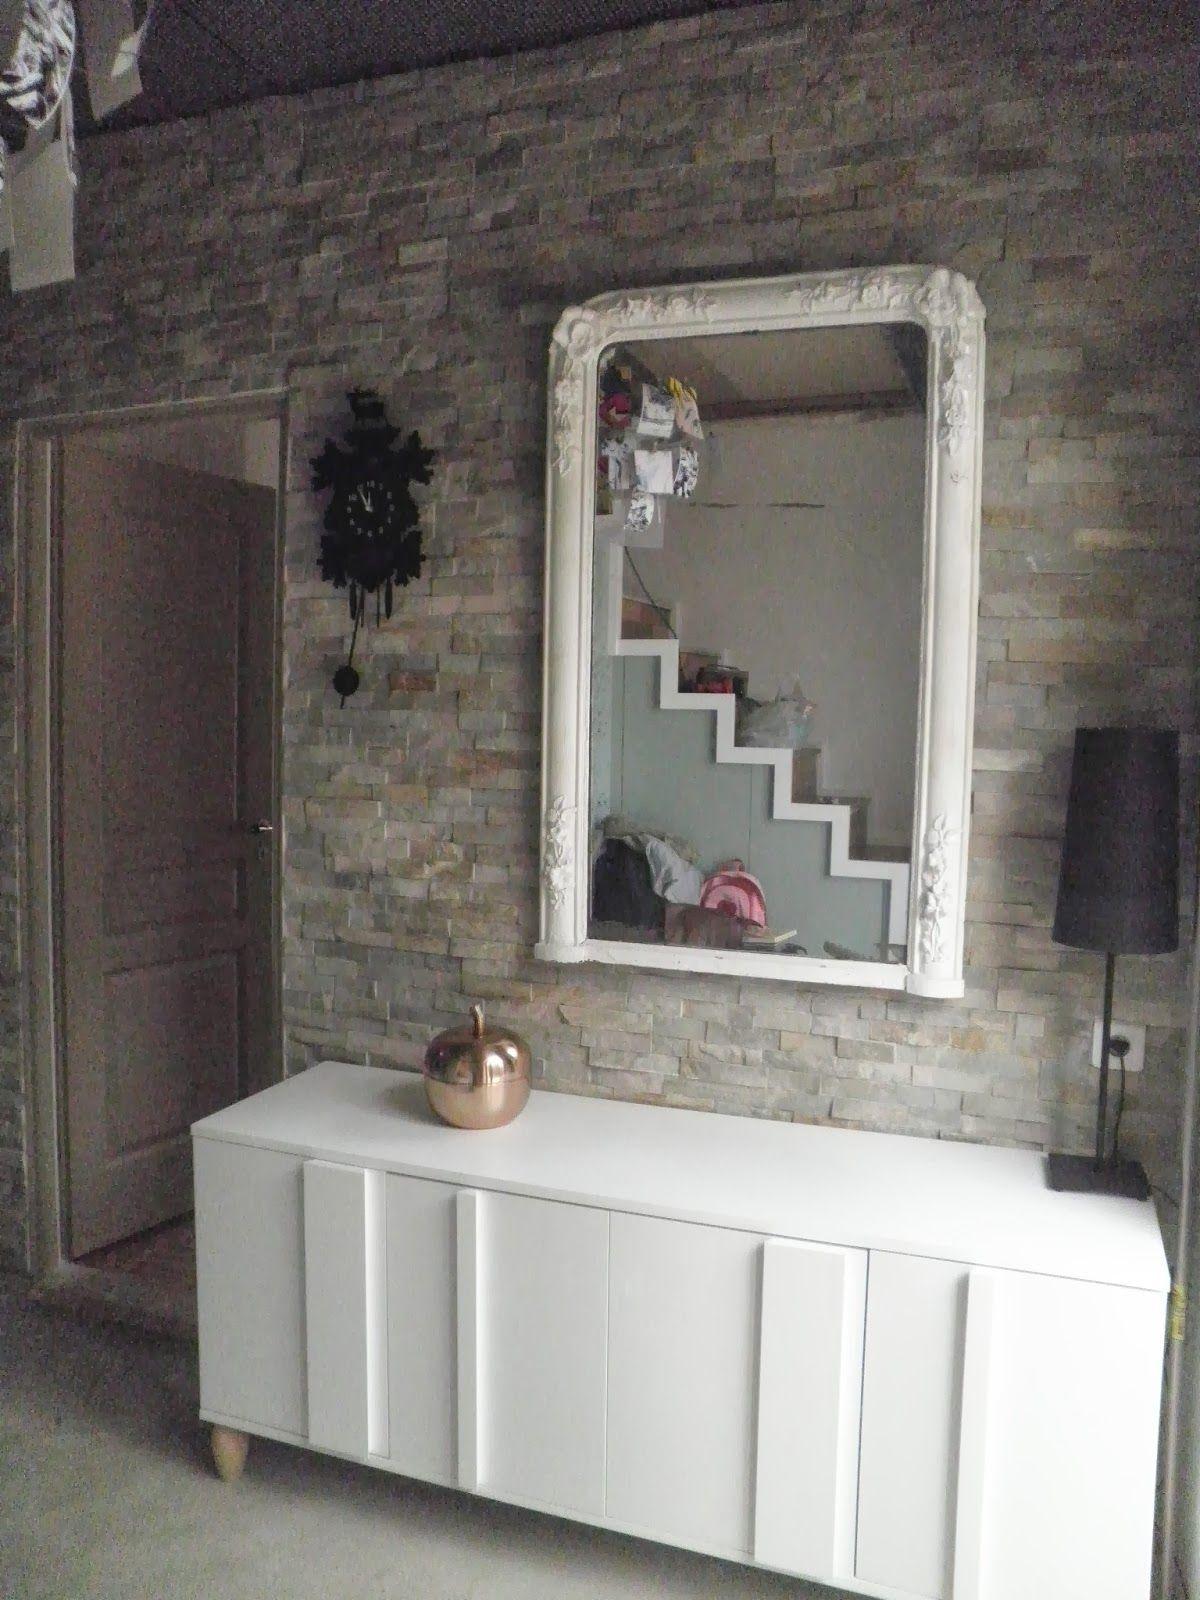 Customiser Un Cadre De Miroir diy miroir customisé | customiser meuble, renover meuble